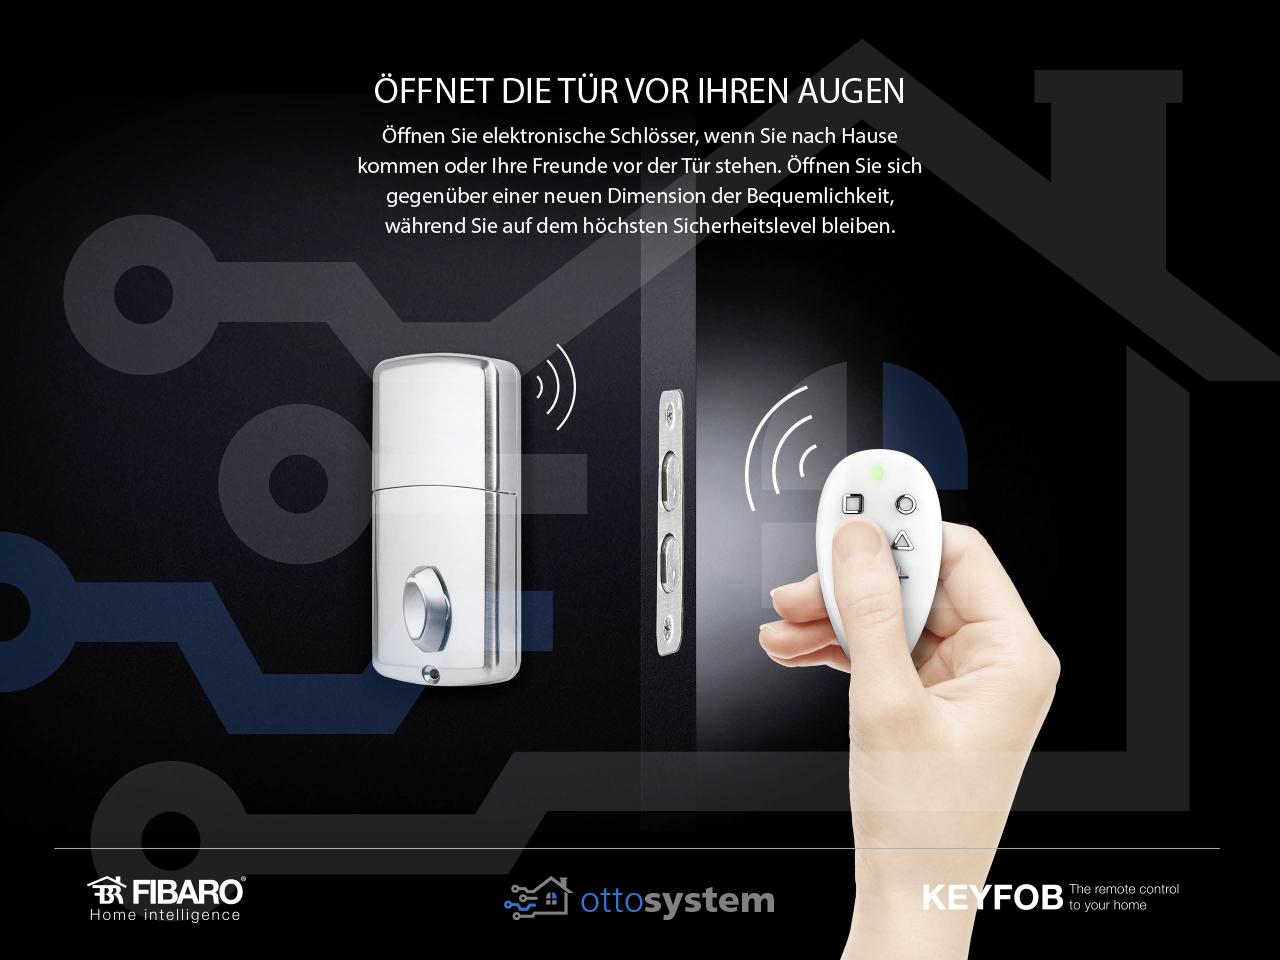 Pr-sentation_FIBARO_KeyFob_ottosystem-13